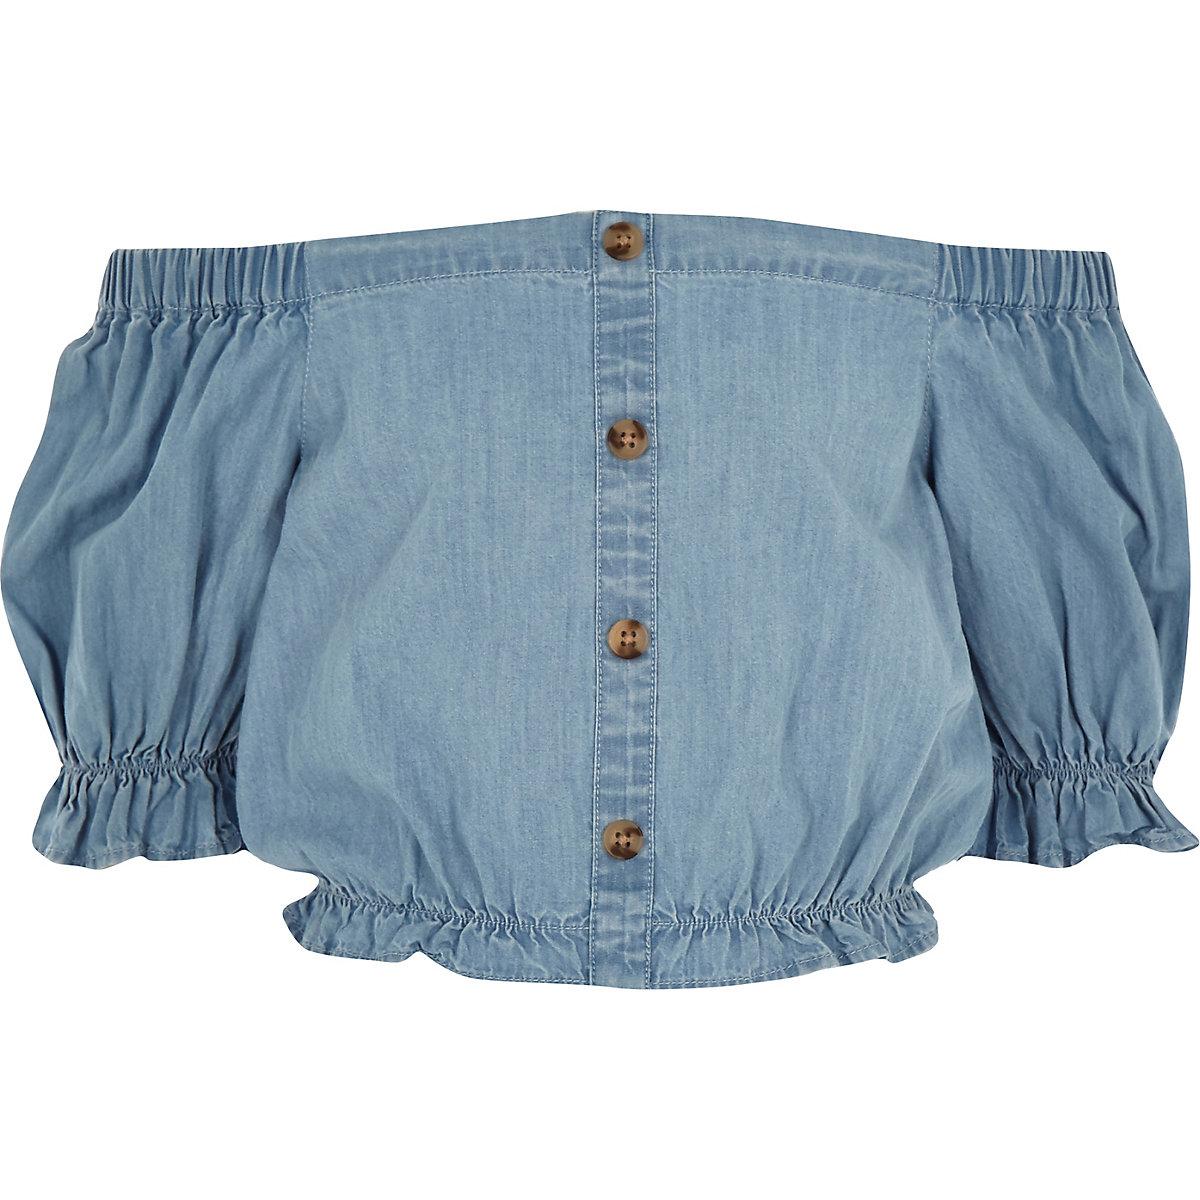 Girls blue denim bardot crop top